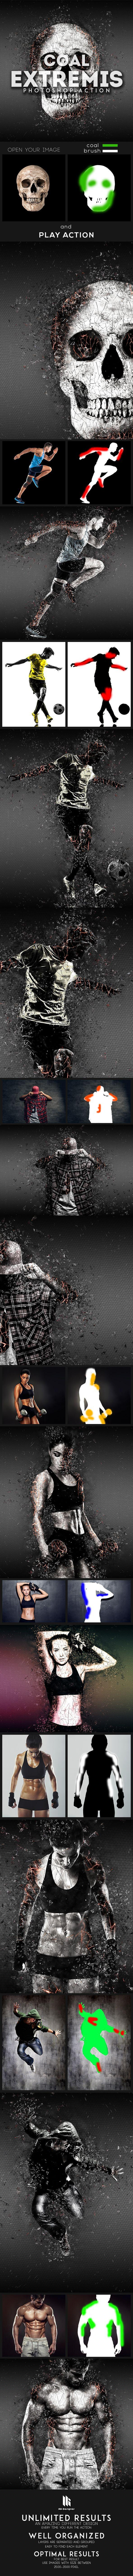 Coal Extremis Photoshop Action — Photoshop ATN #actions #texture • Download ➝ https://graphicriver.net/item/coal-extremis-photoshop-action/20287392?ref=pxcr #photoshopmontajes